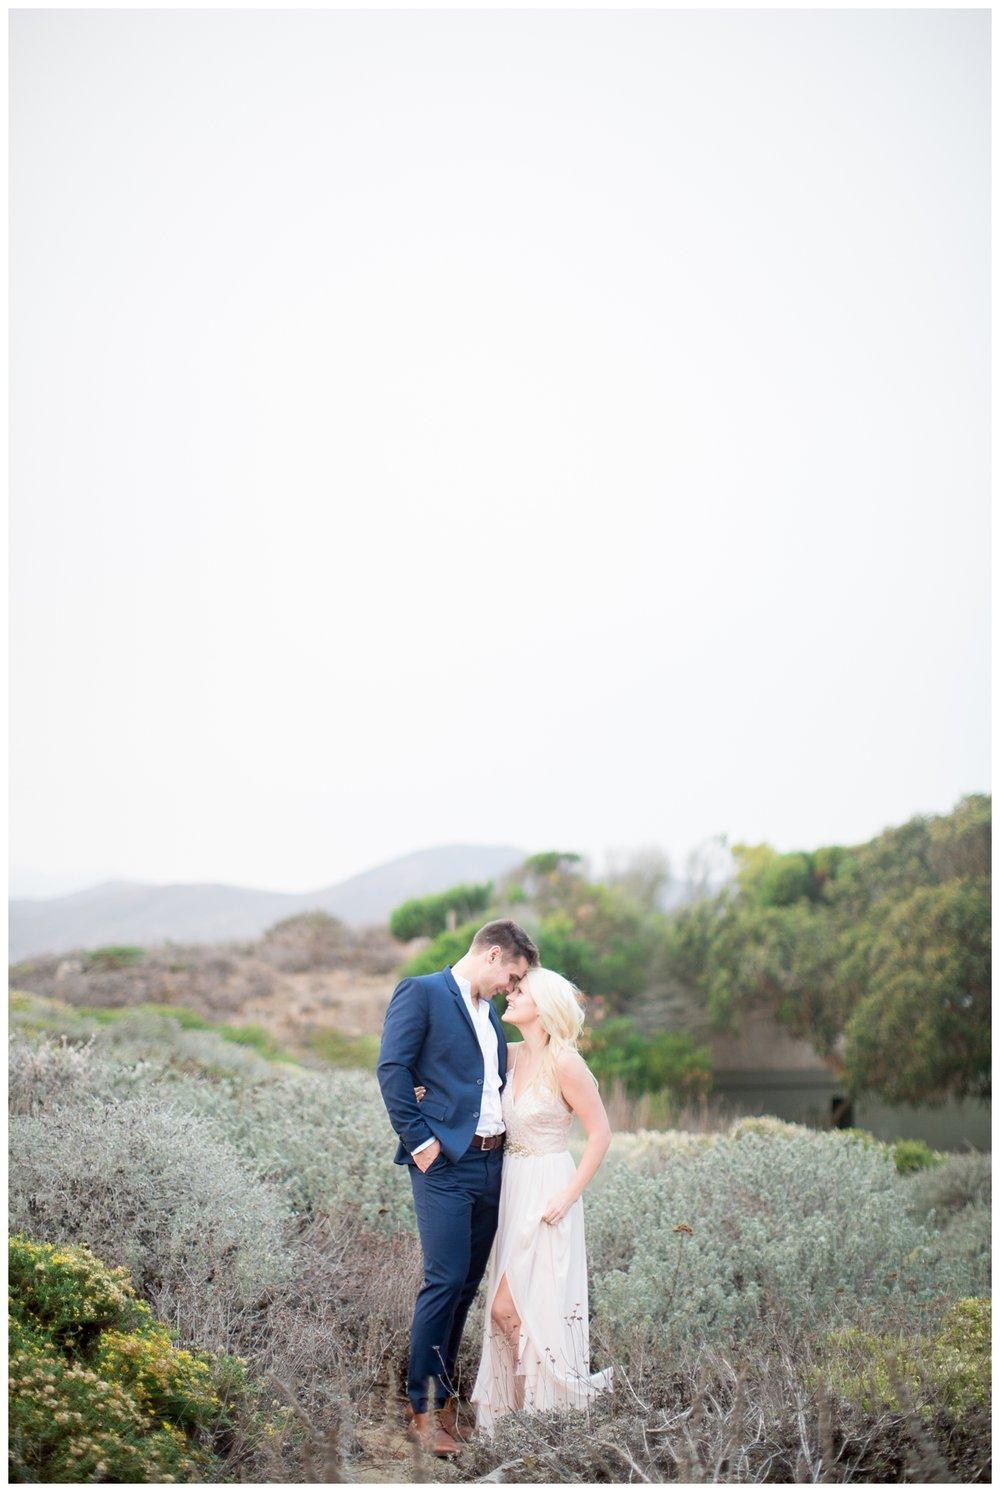 Baker-Beach-San-Francisco-Engagement-Photos_6403.jpg